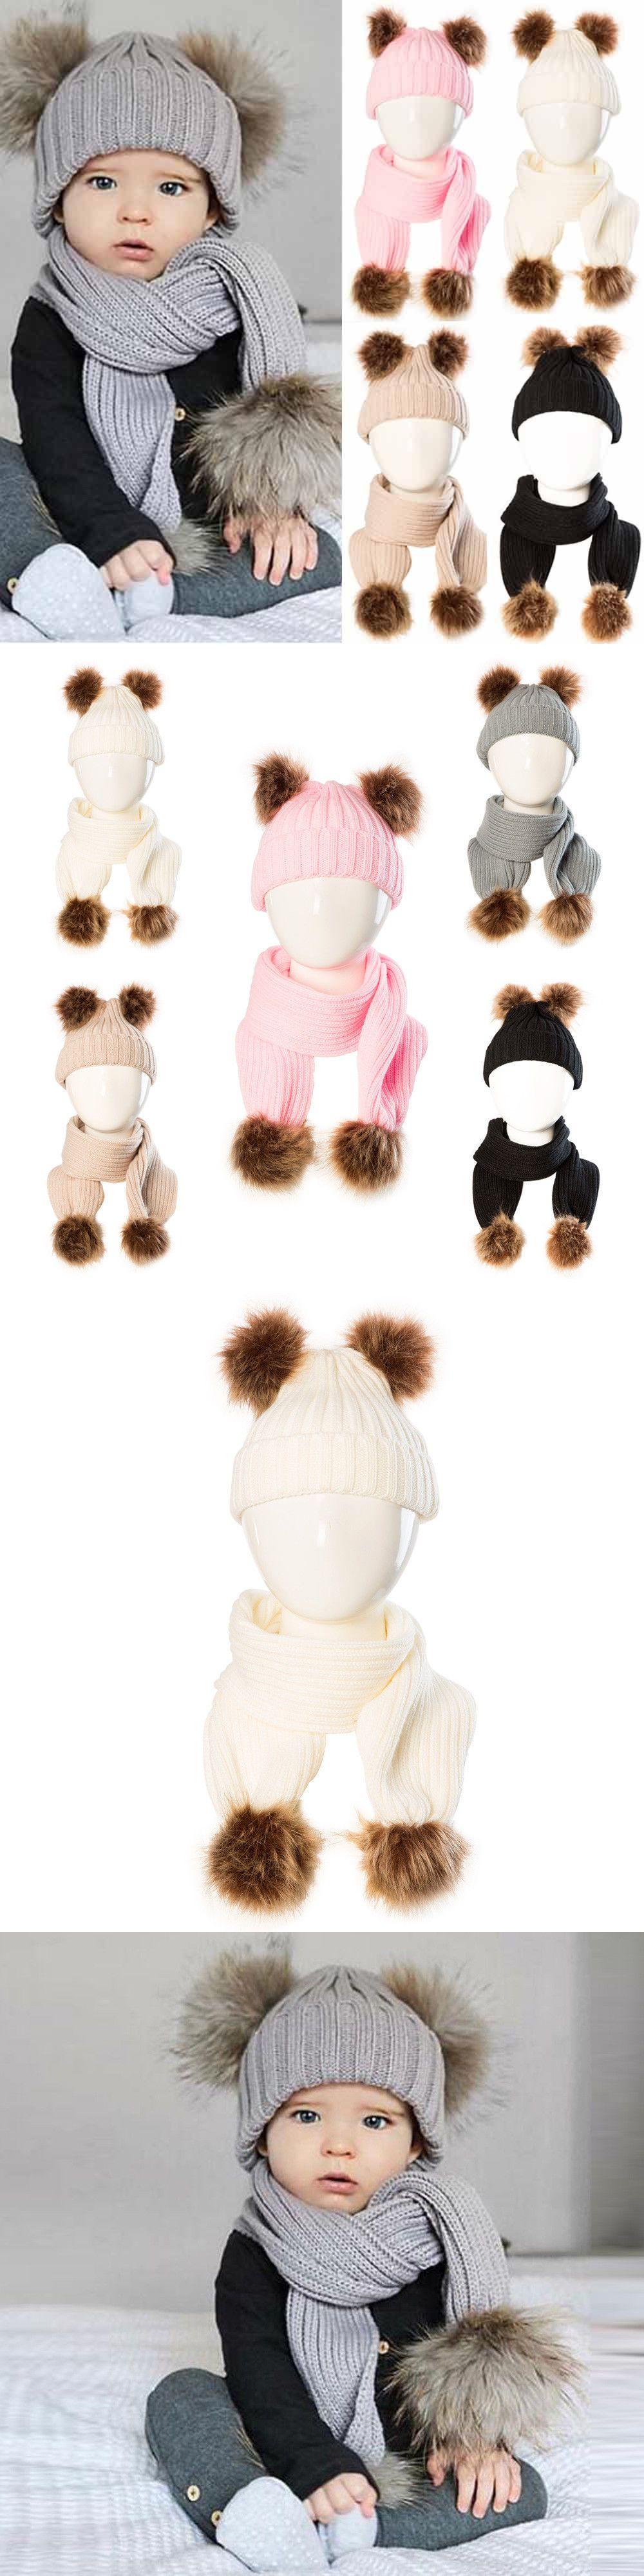 a544160bb8f Scarves 175523  2Pcs Newborn Baby Kids Boy Girl Winter Warm Cap Fur Pom  Knitted Beanie Hat+Scarf -  BUY IT NOW ONLY   10.64 on  eBay  scarves   newborn ...